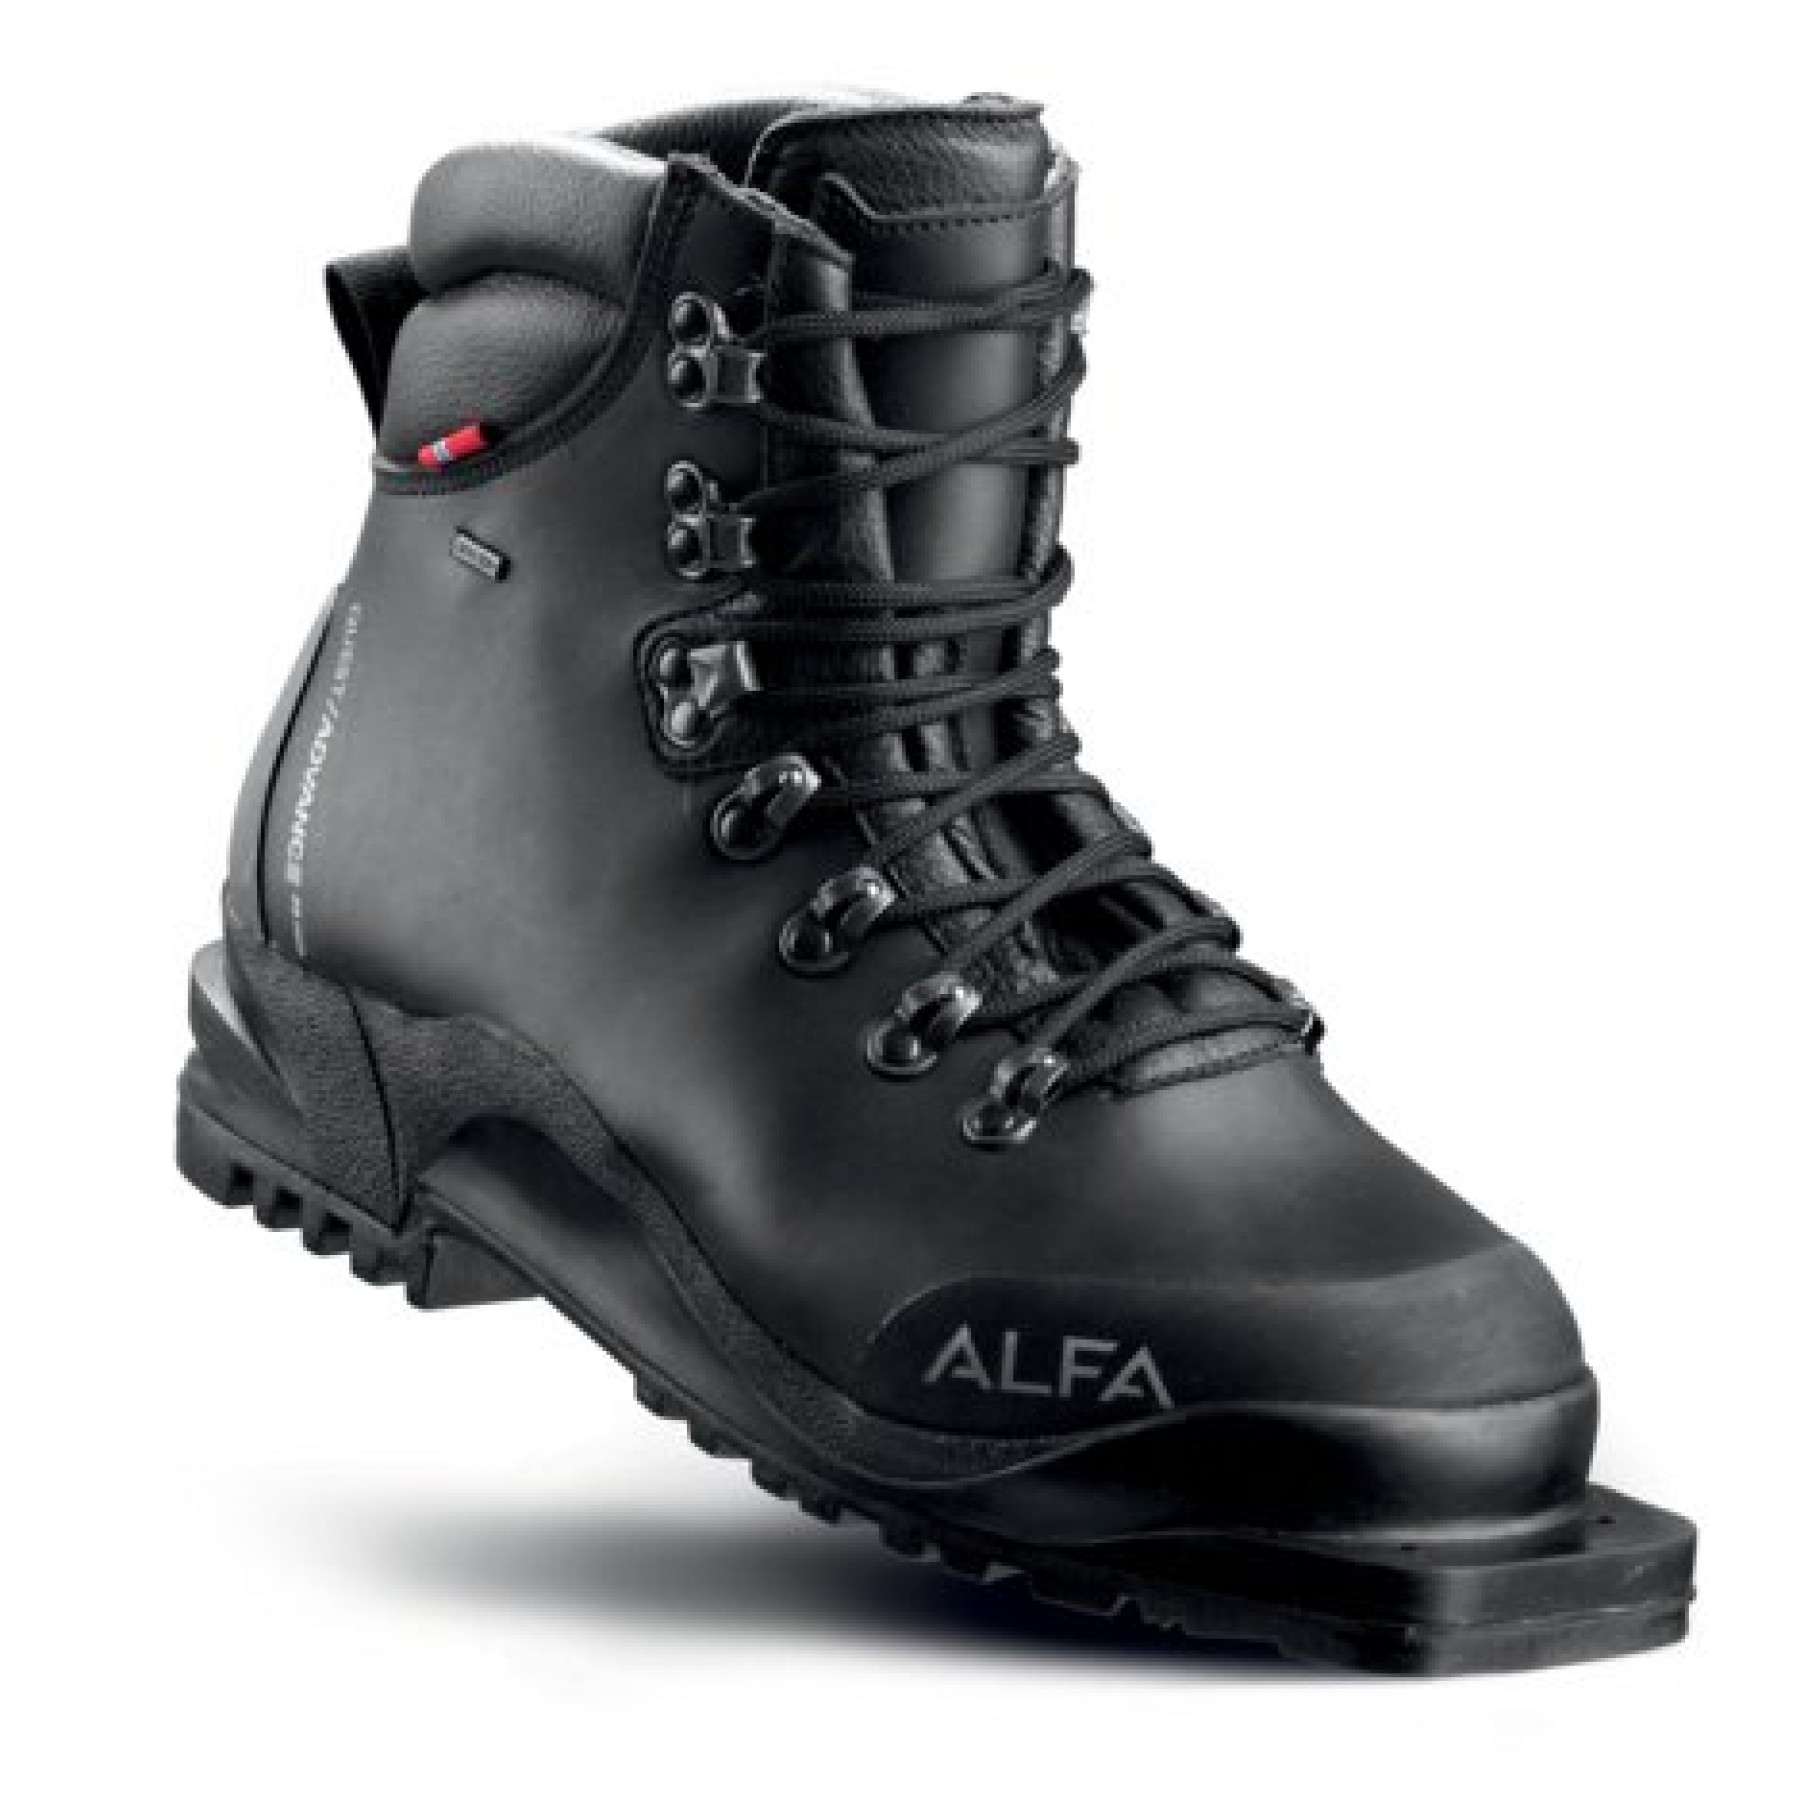 Alfa Quest Advance 75 mm fjellskistøvler